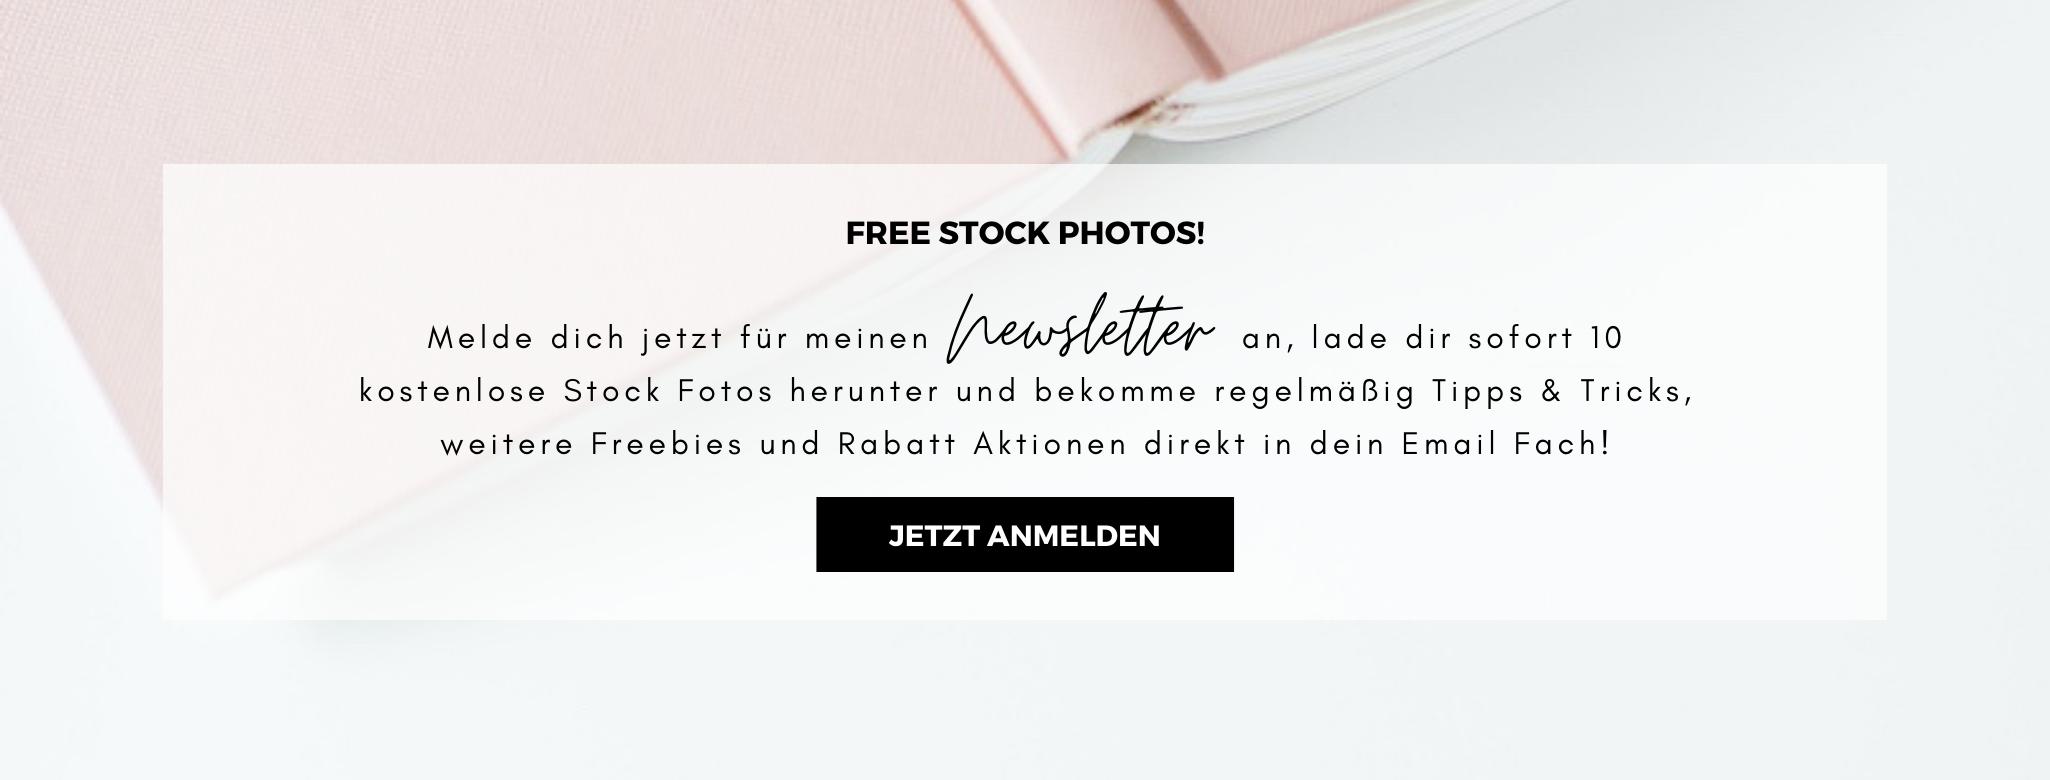 freestocksgc